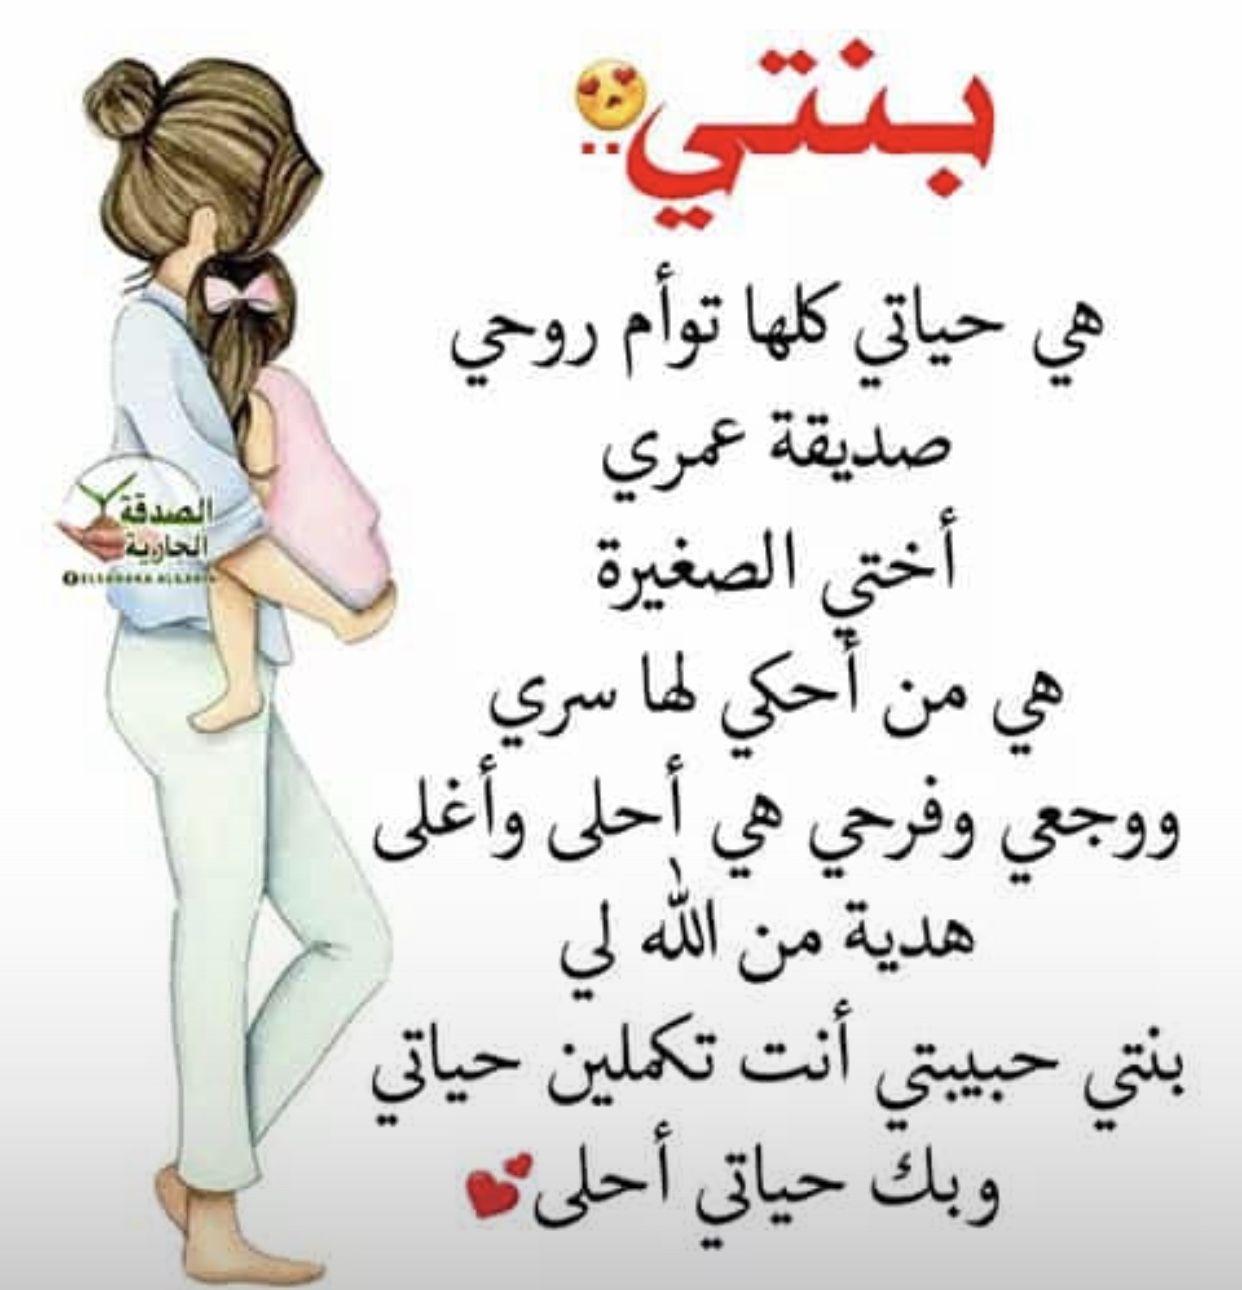 Pin By رهيفه المشاعر On صوري 21st